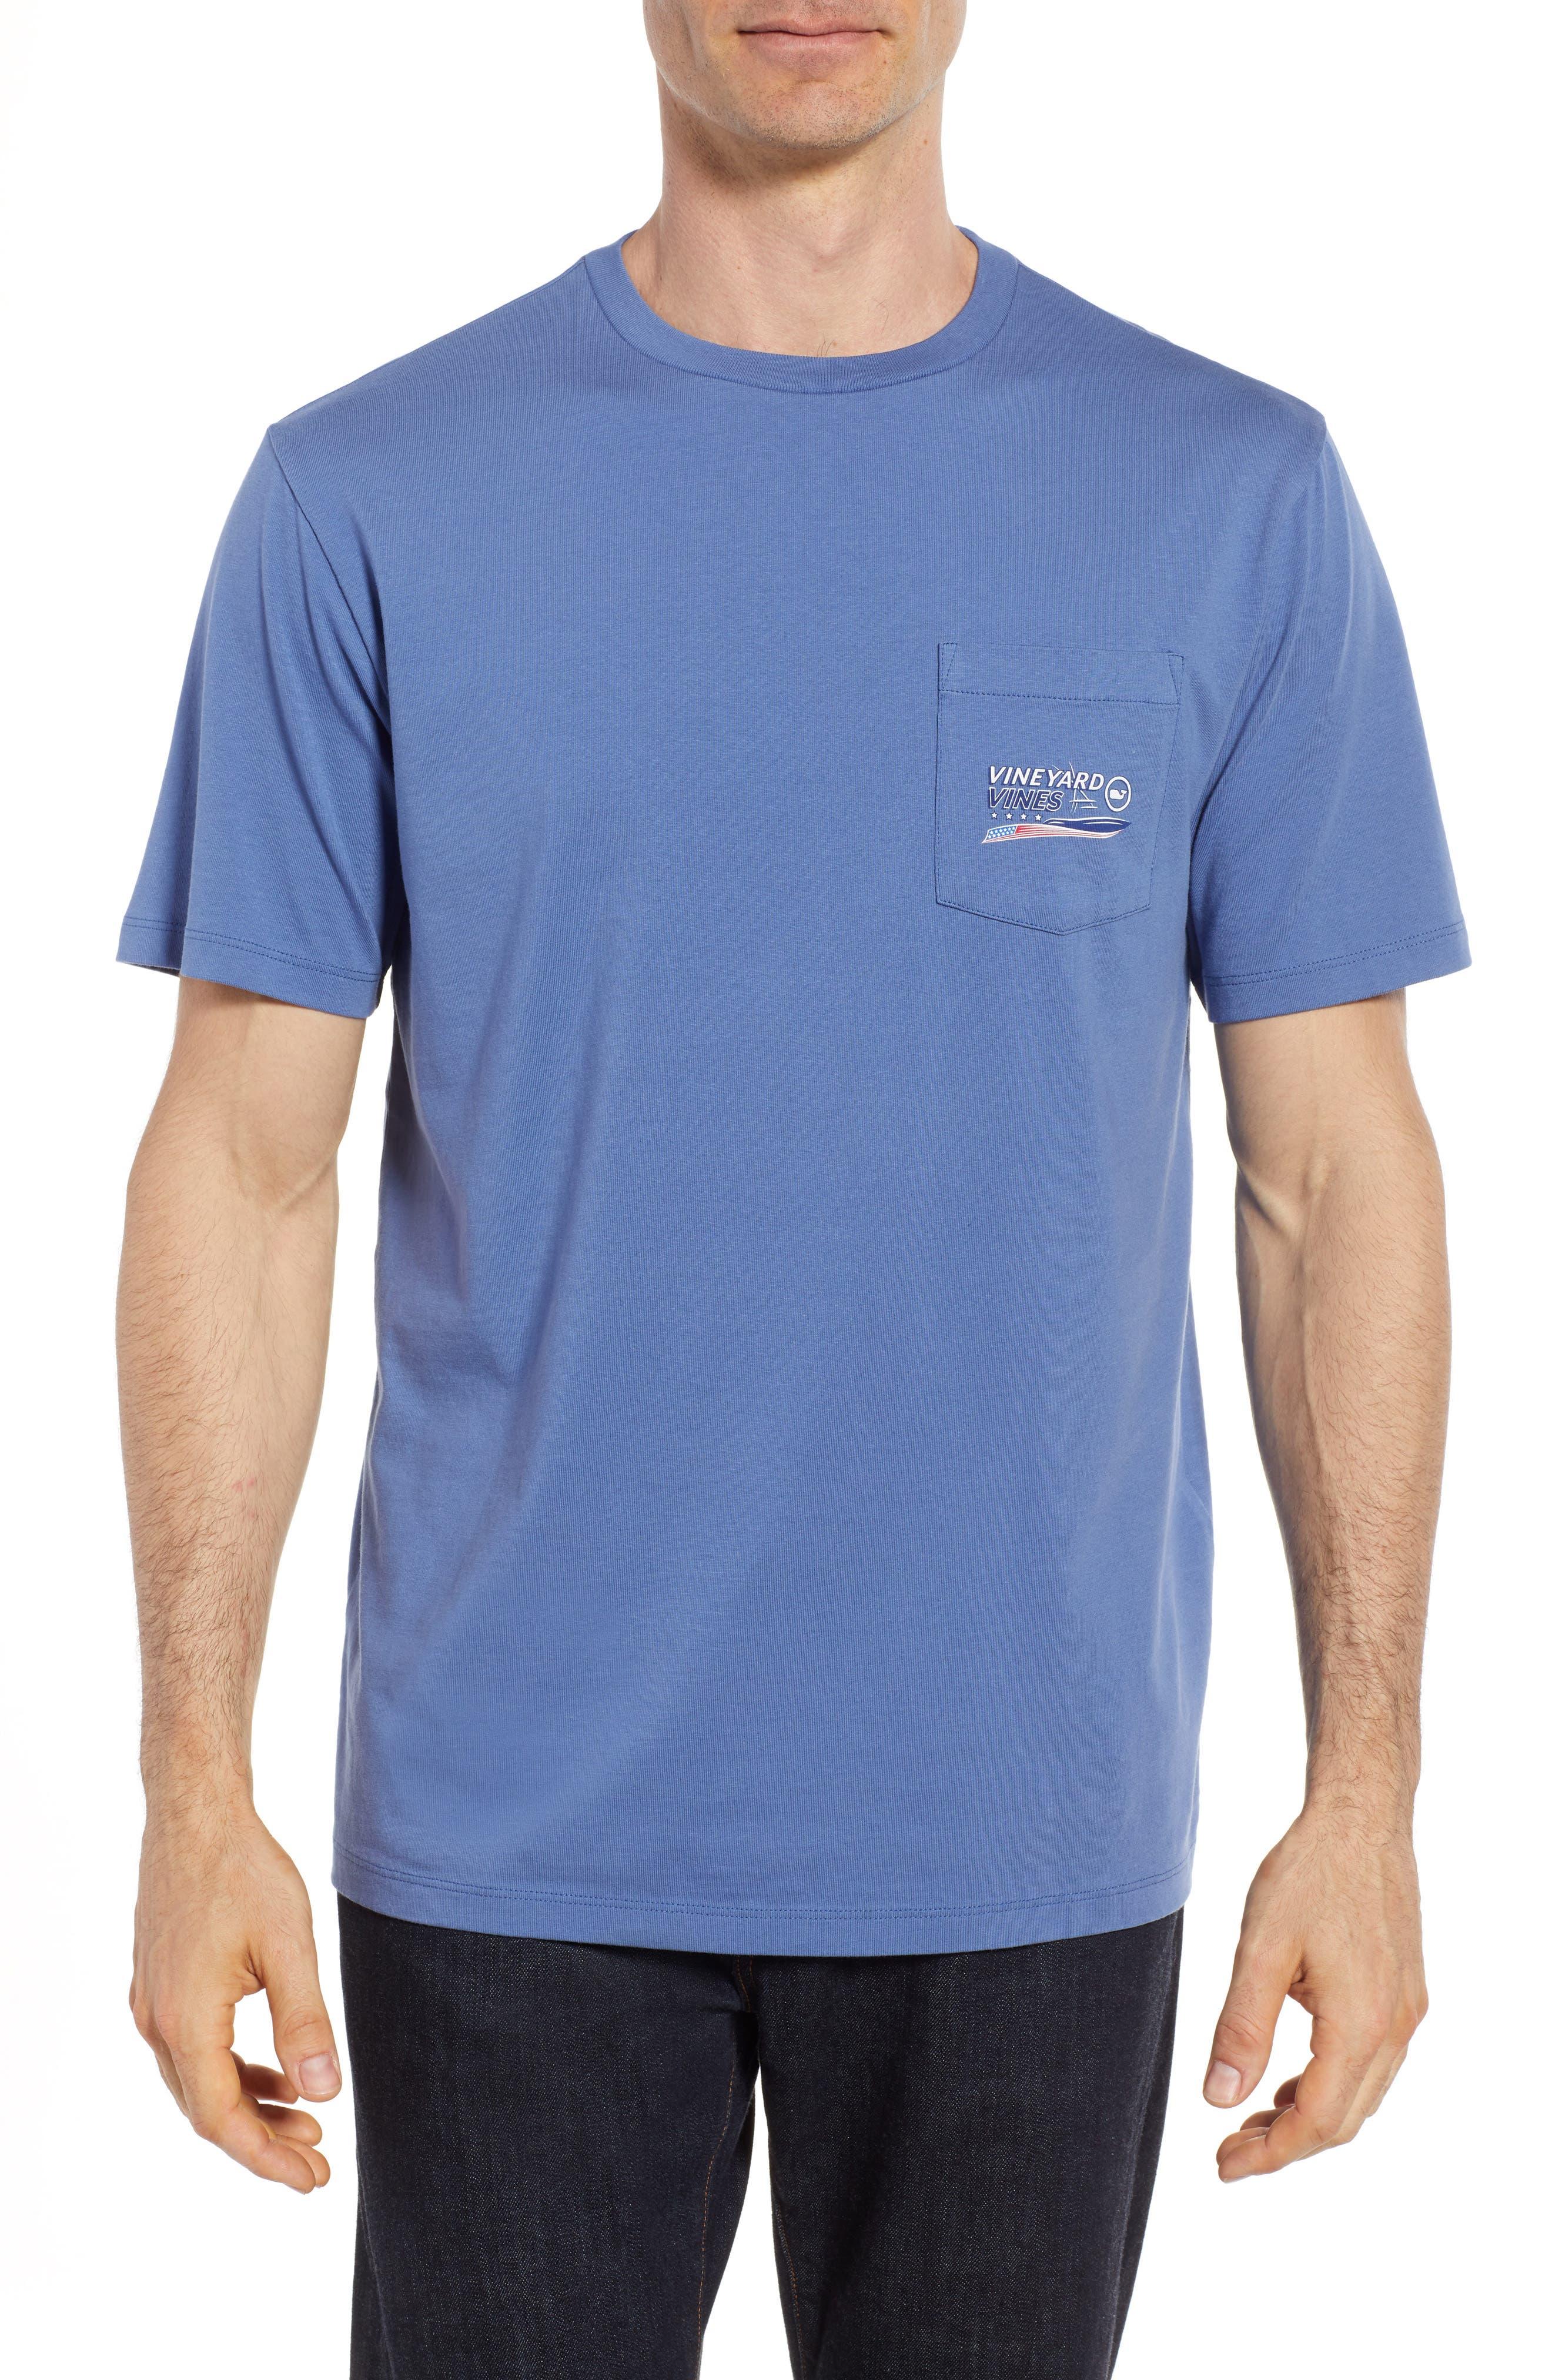 American Sportfisher T-Shirt,                             Main thumbnail 1, color,